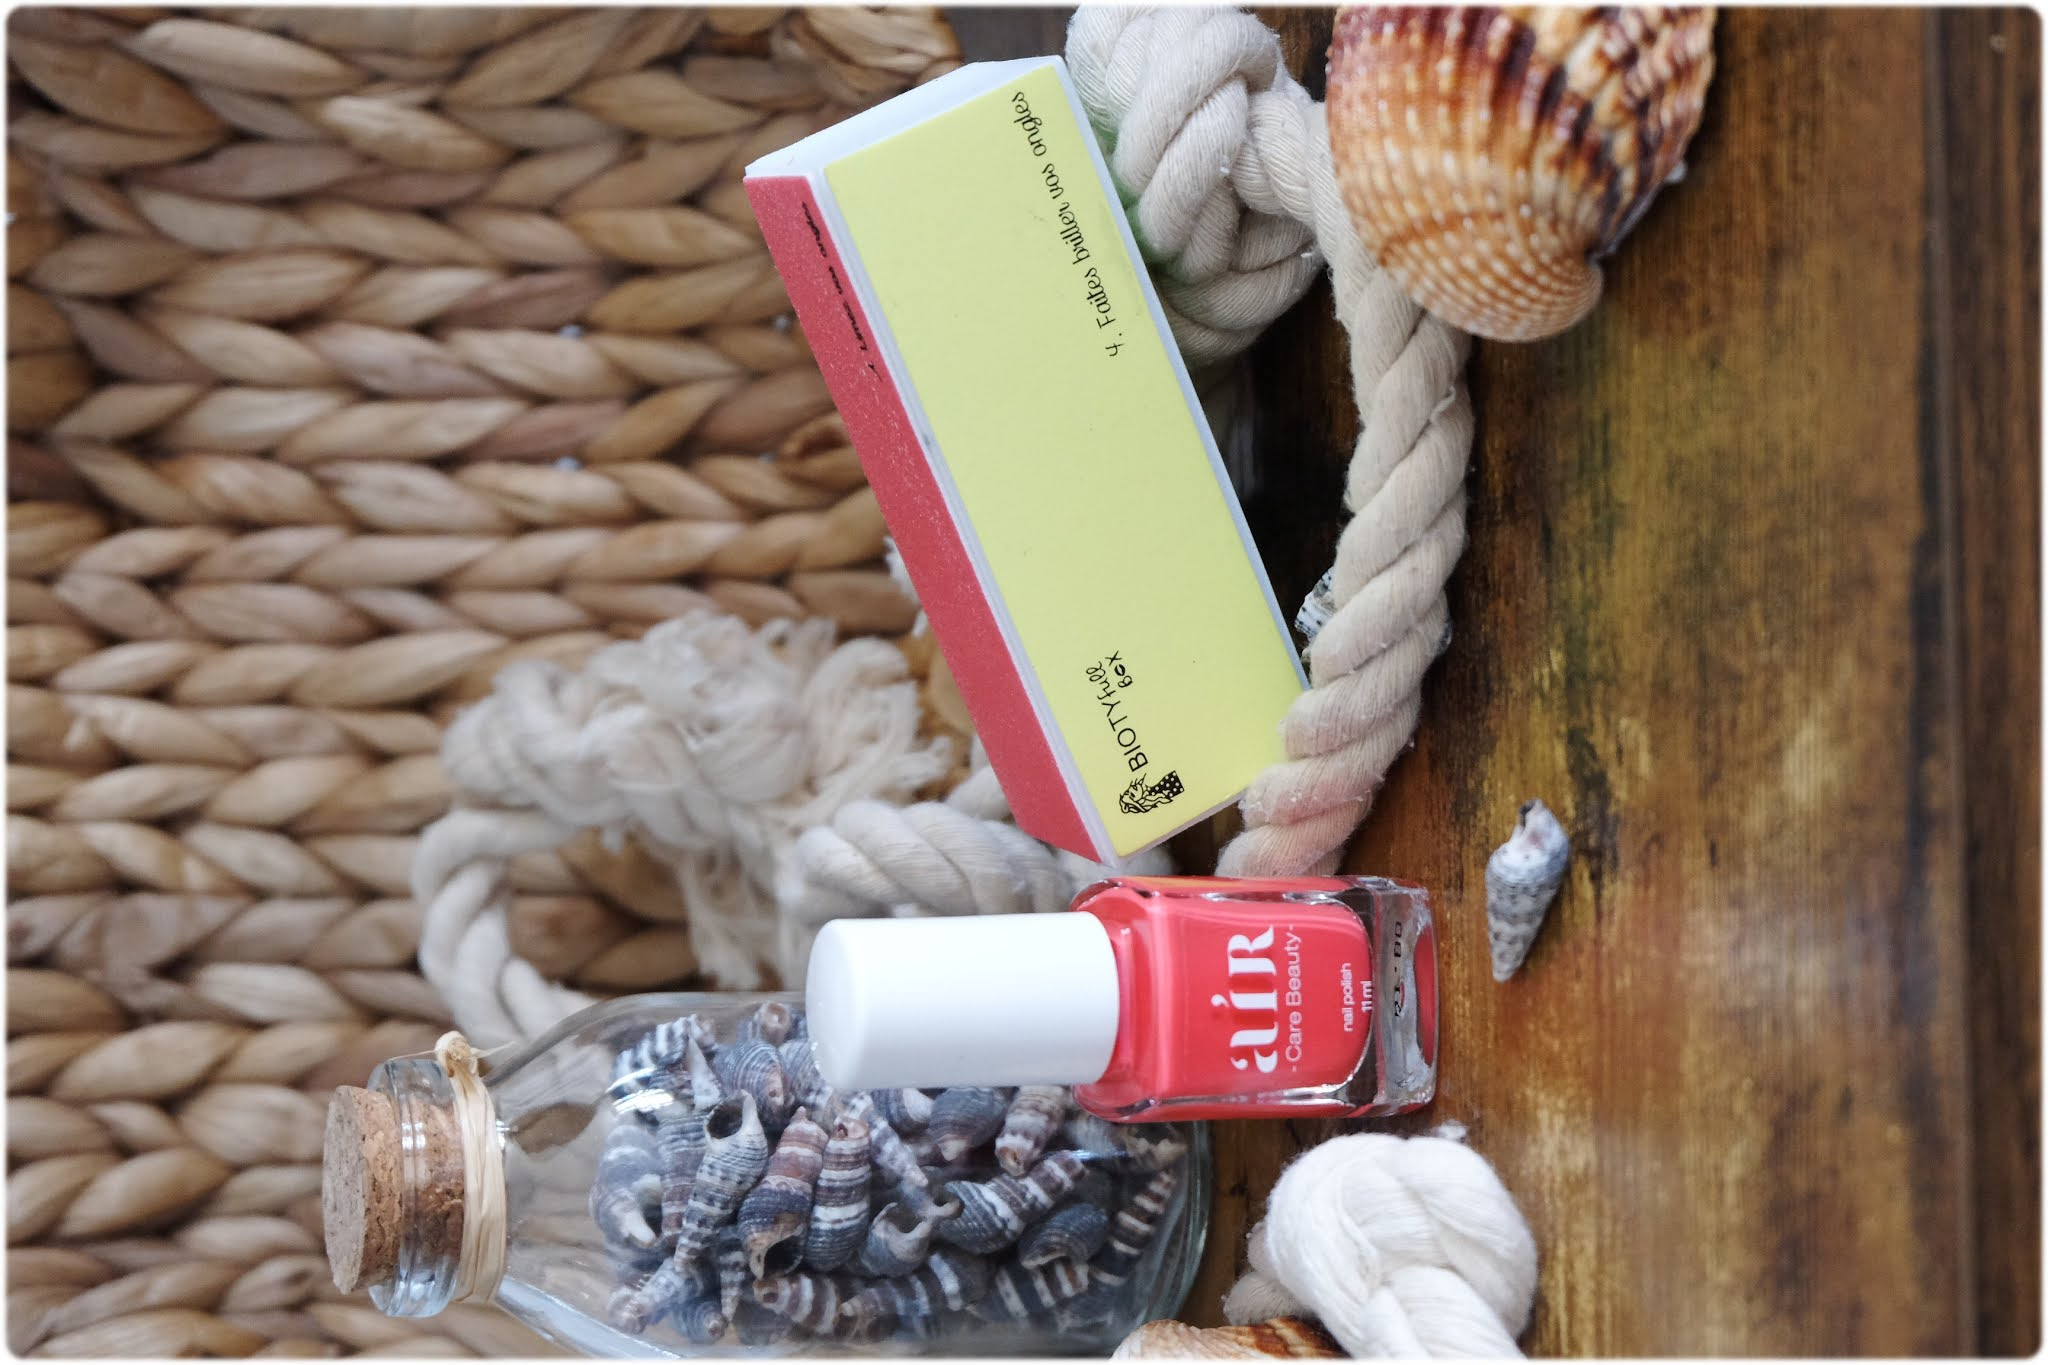 Biotyfull box juillet 2020 vernis corail